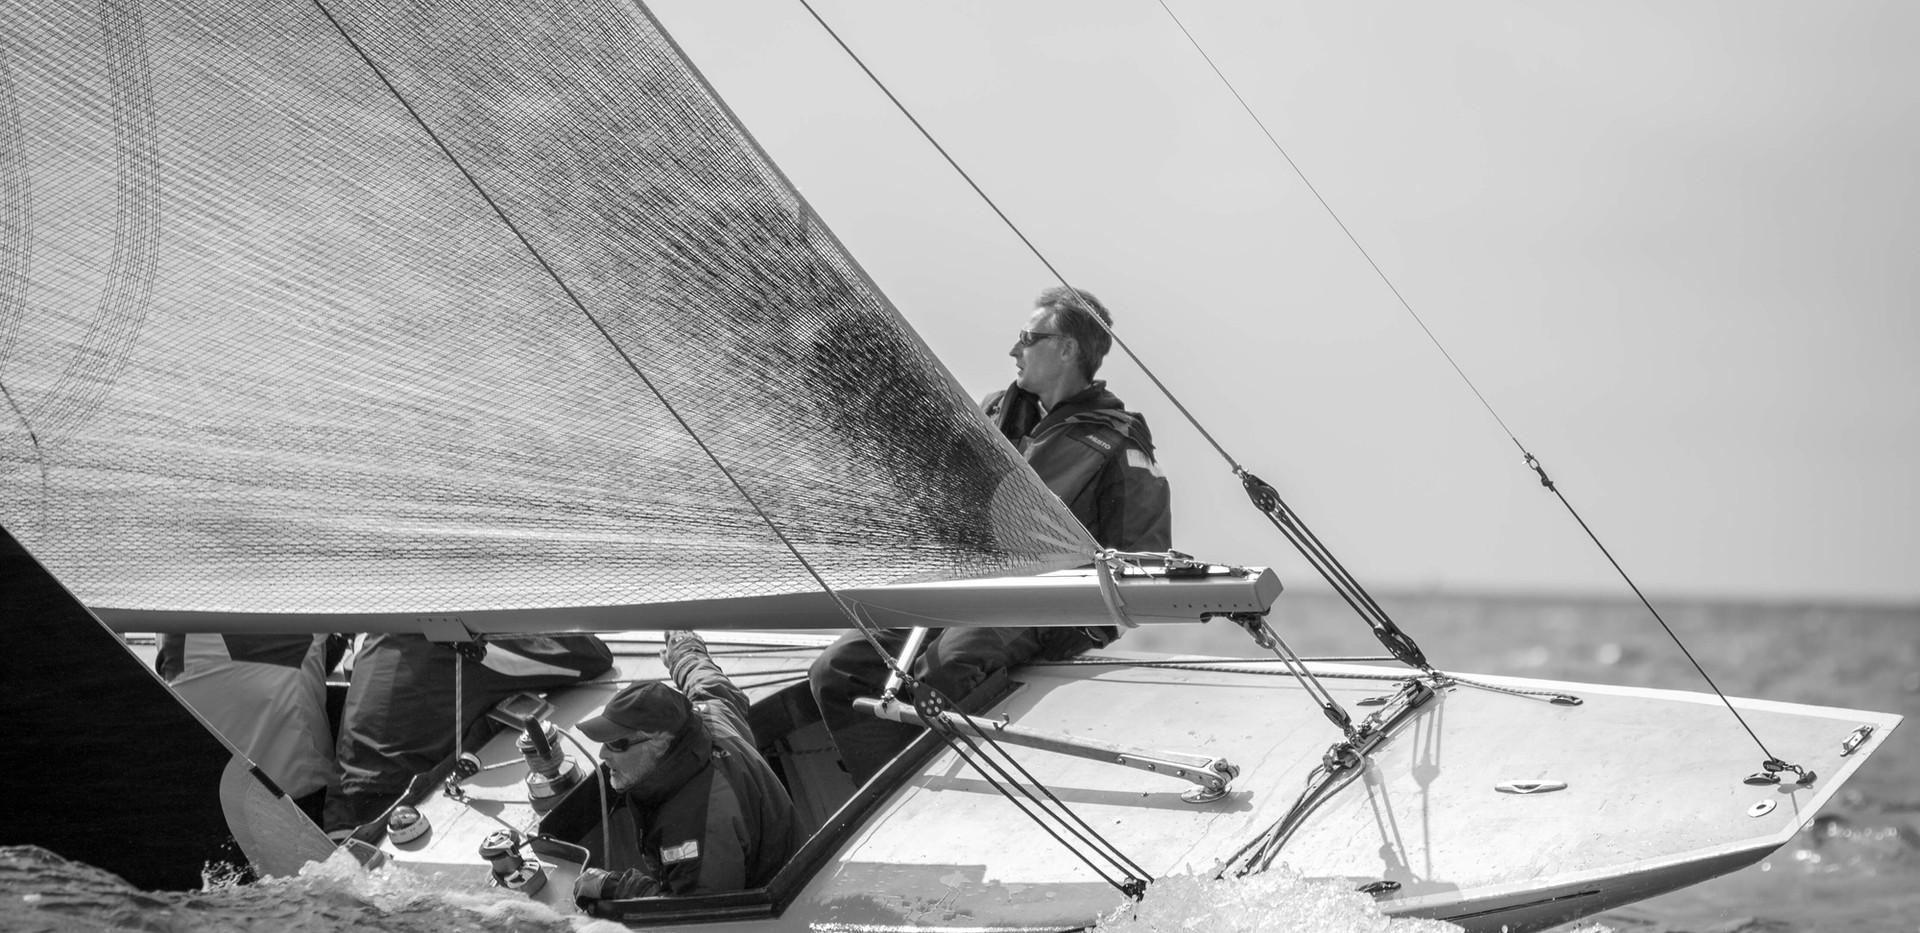 Victoria - Johan Anker 6 Metre